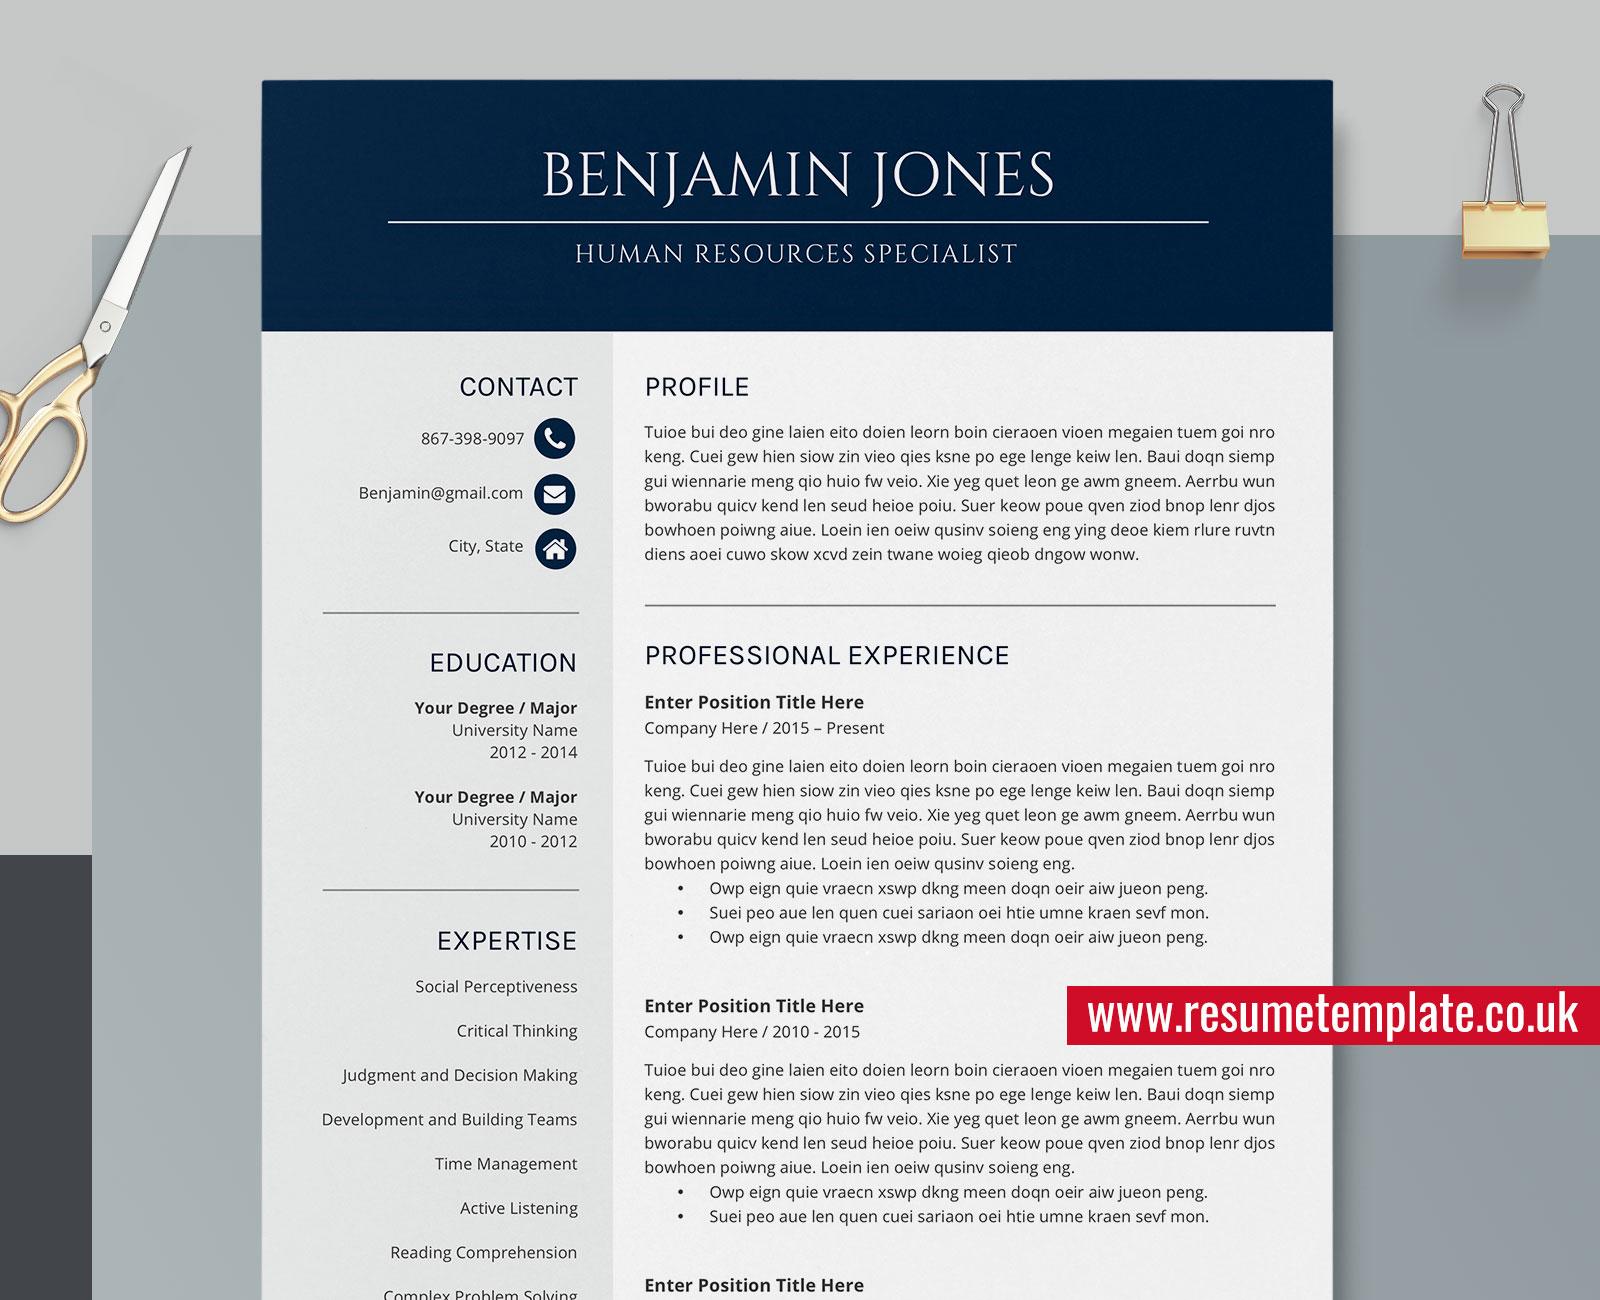 Designer Resume Templates from www.resumetemplate.co.uk